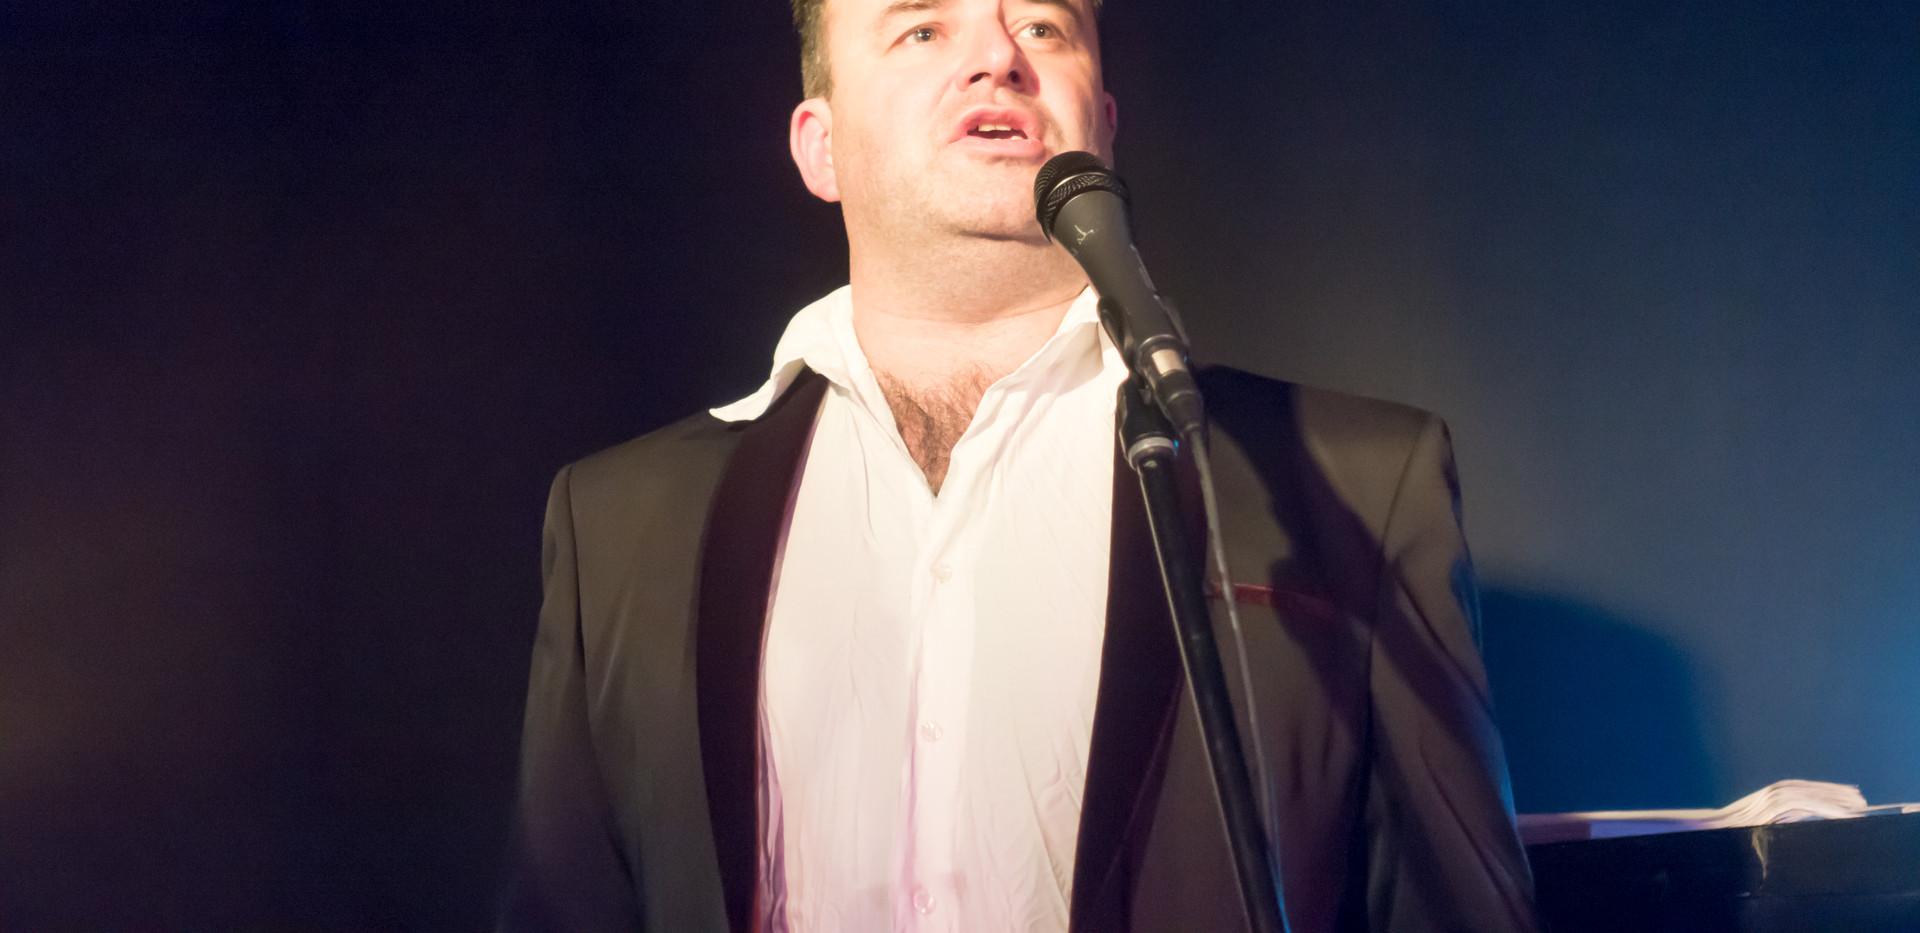 Tim McArthur